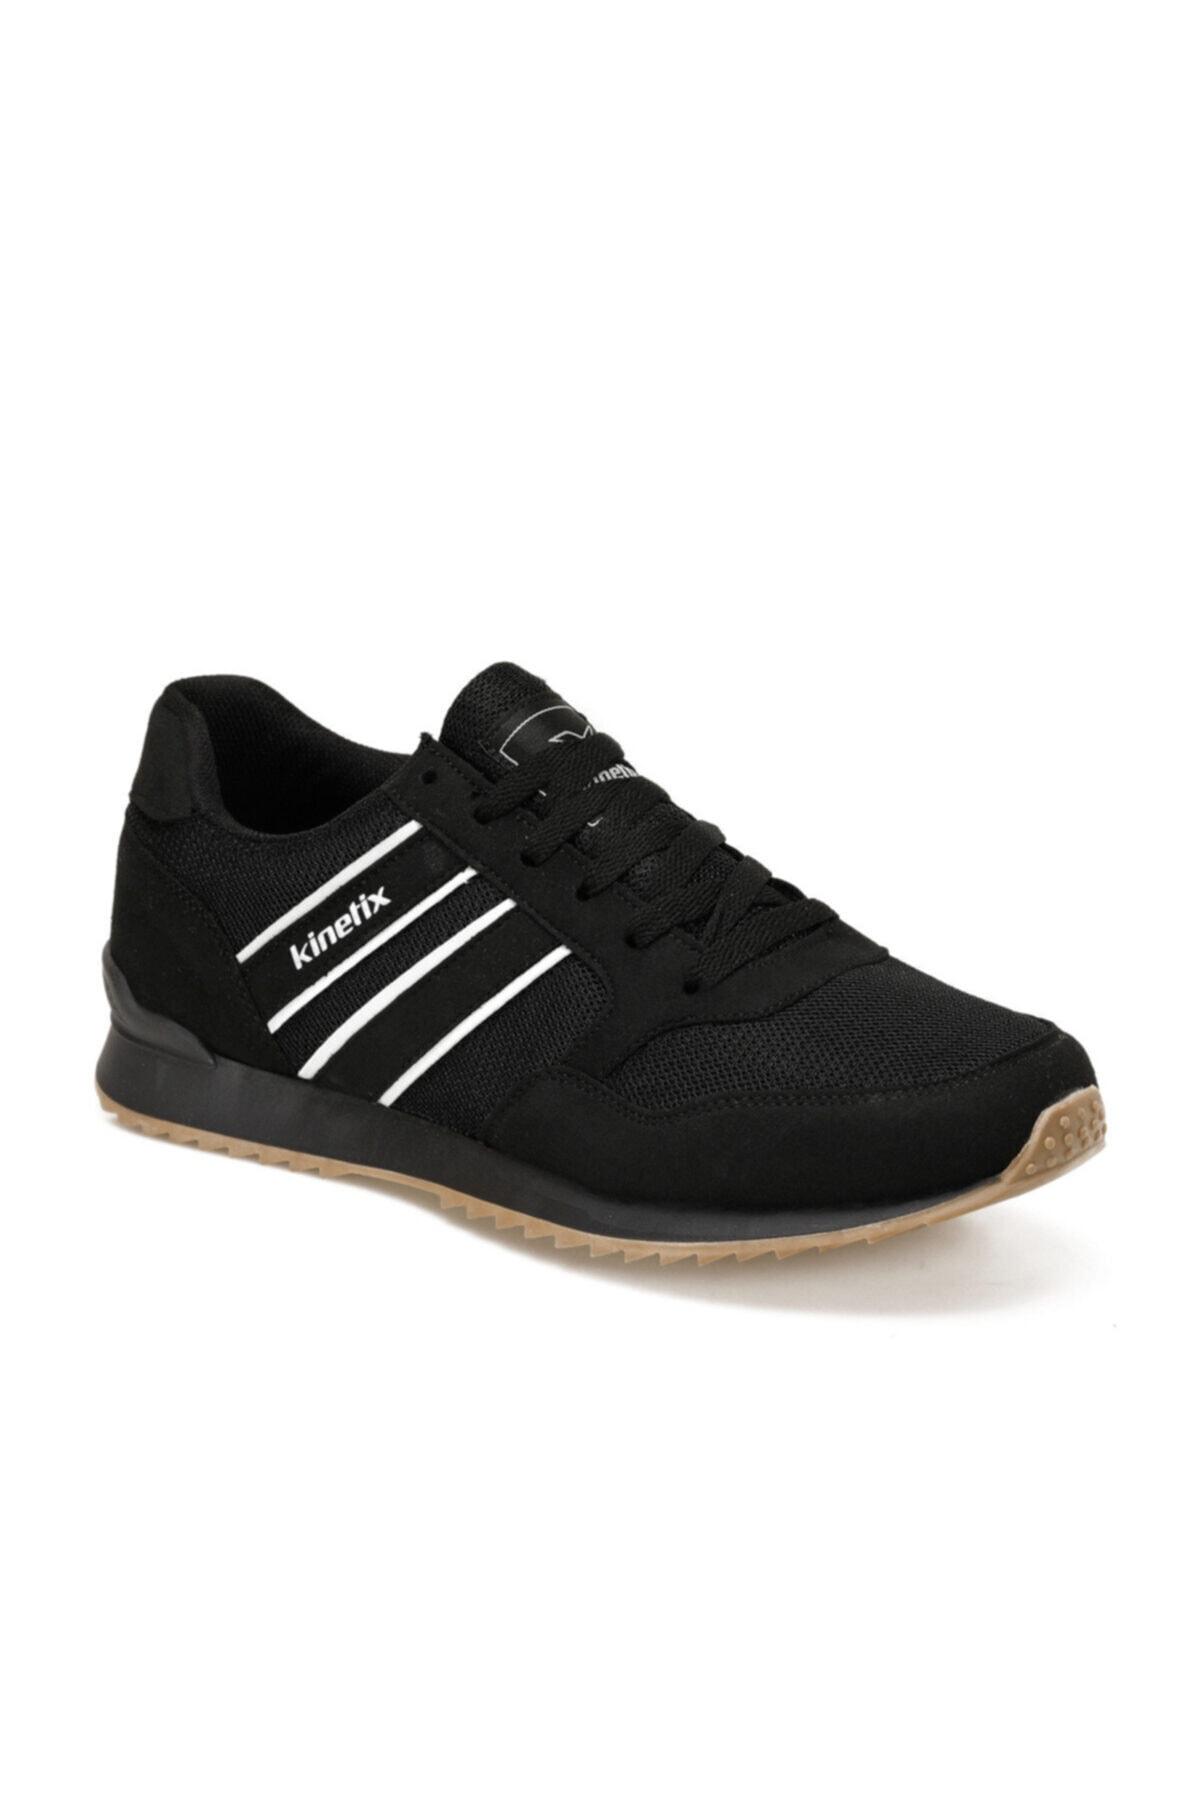 کفش اسپرت ساده برند کینتیکس kinetix رنگ مشکی کد ty34591436